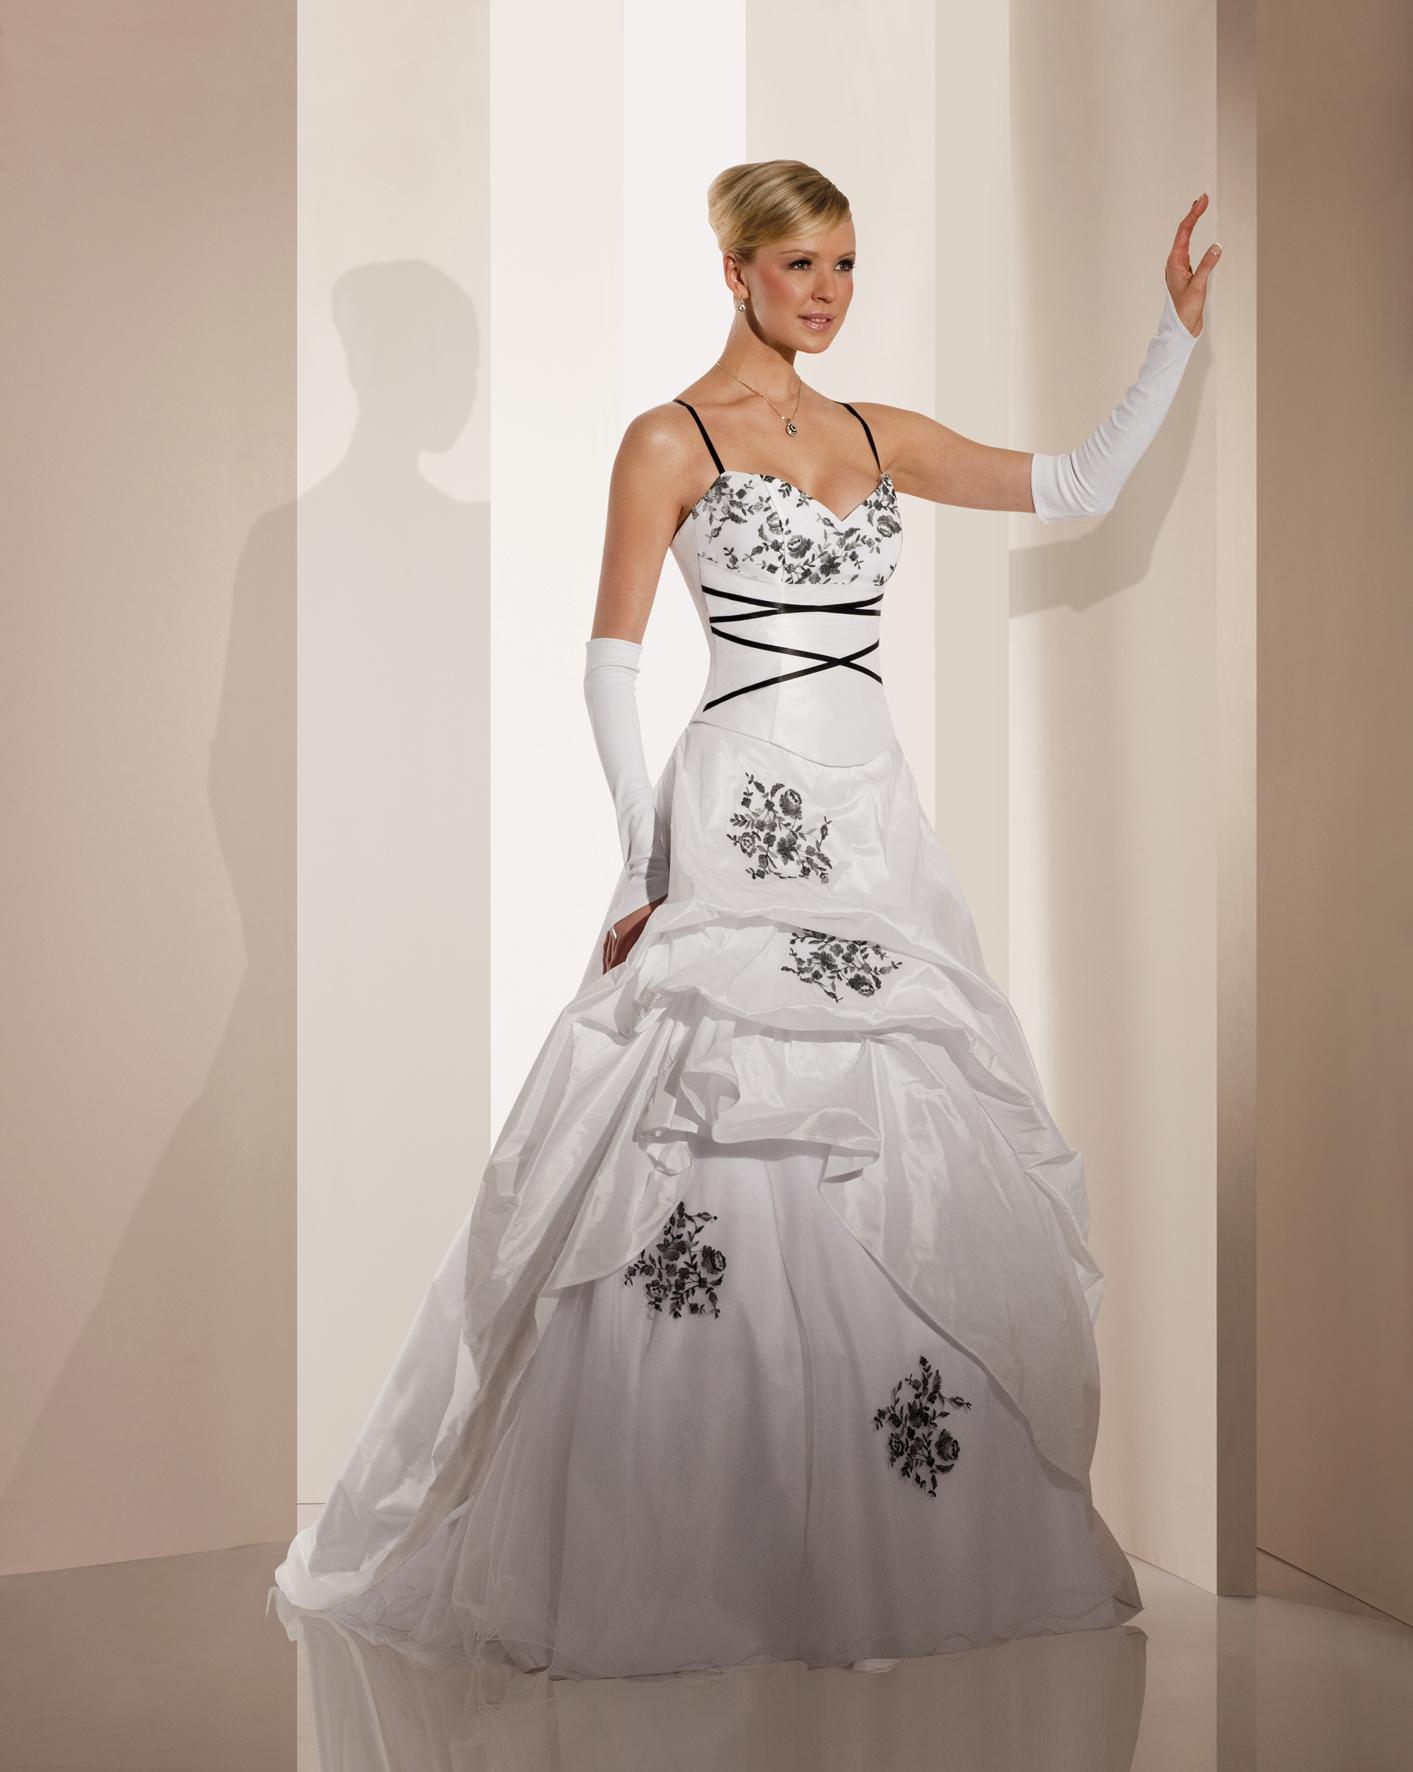 Robe mariee noir et blanche